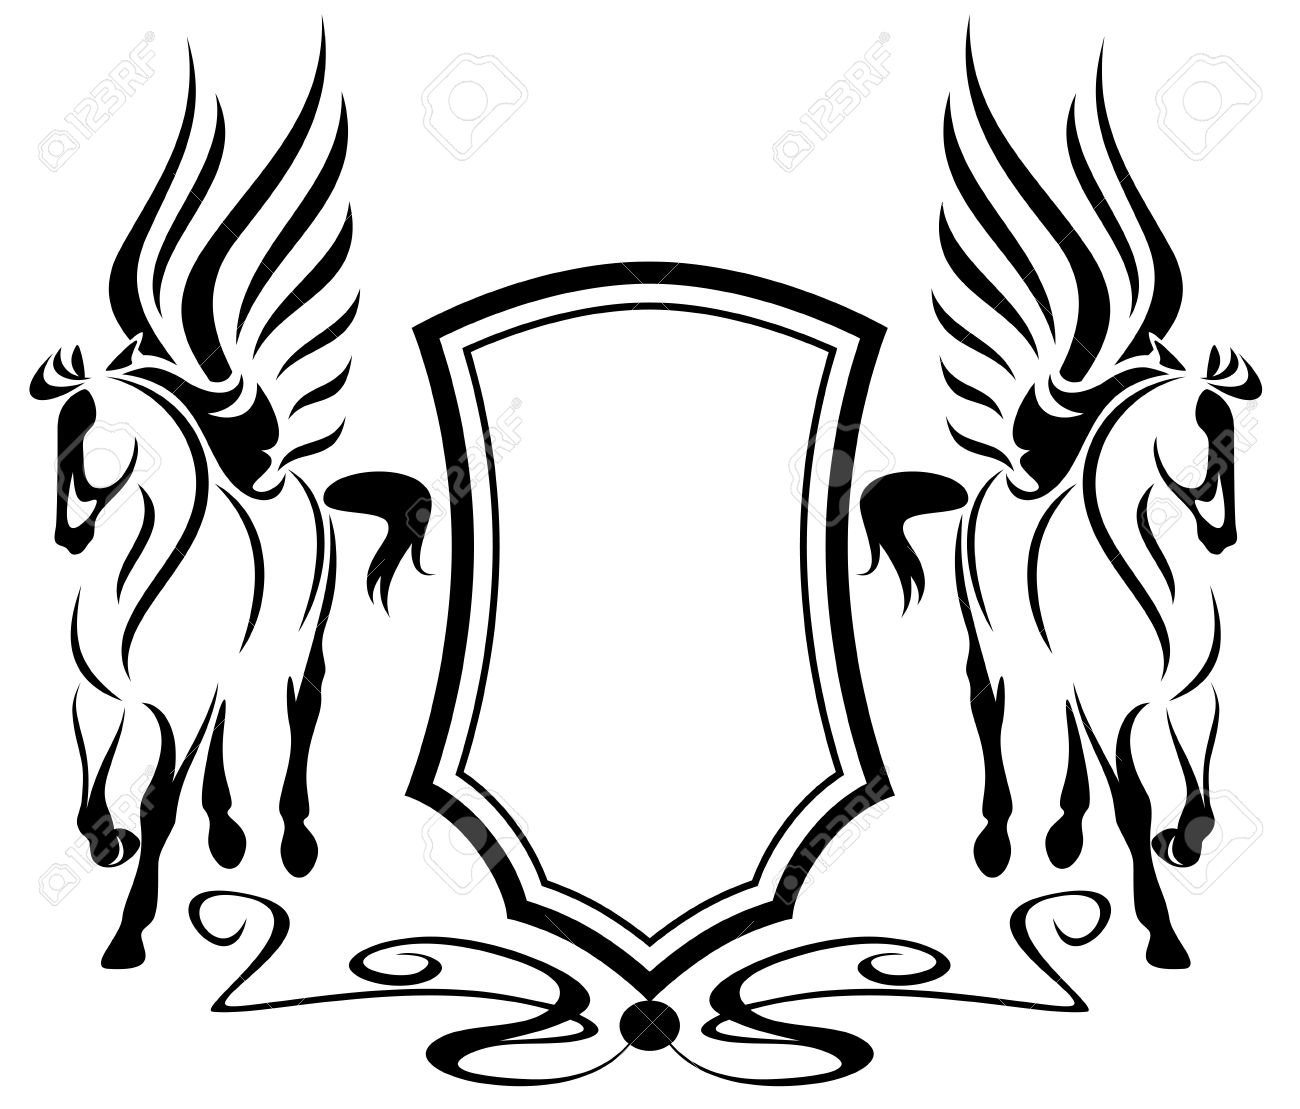 Beautiful pegasus with heraldic shield symbols of inspiration beautiful pegasus with heraldic shield symbols of inspiration in greek mythology stock vector 13013907 buycottarizona Images